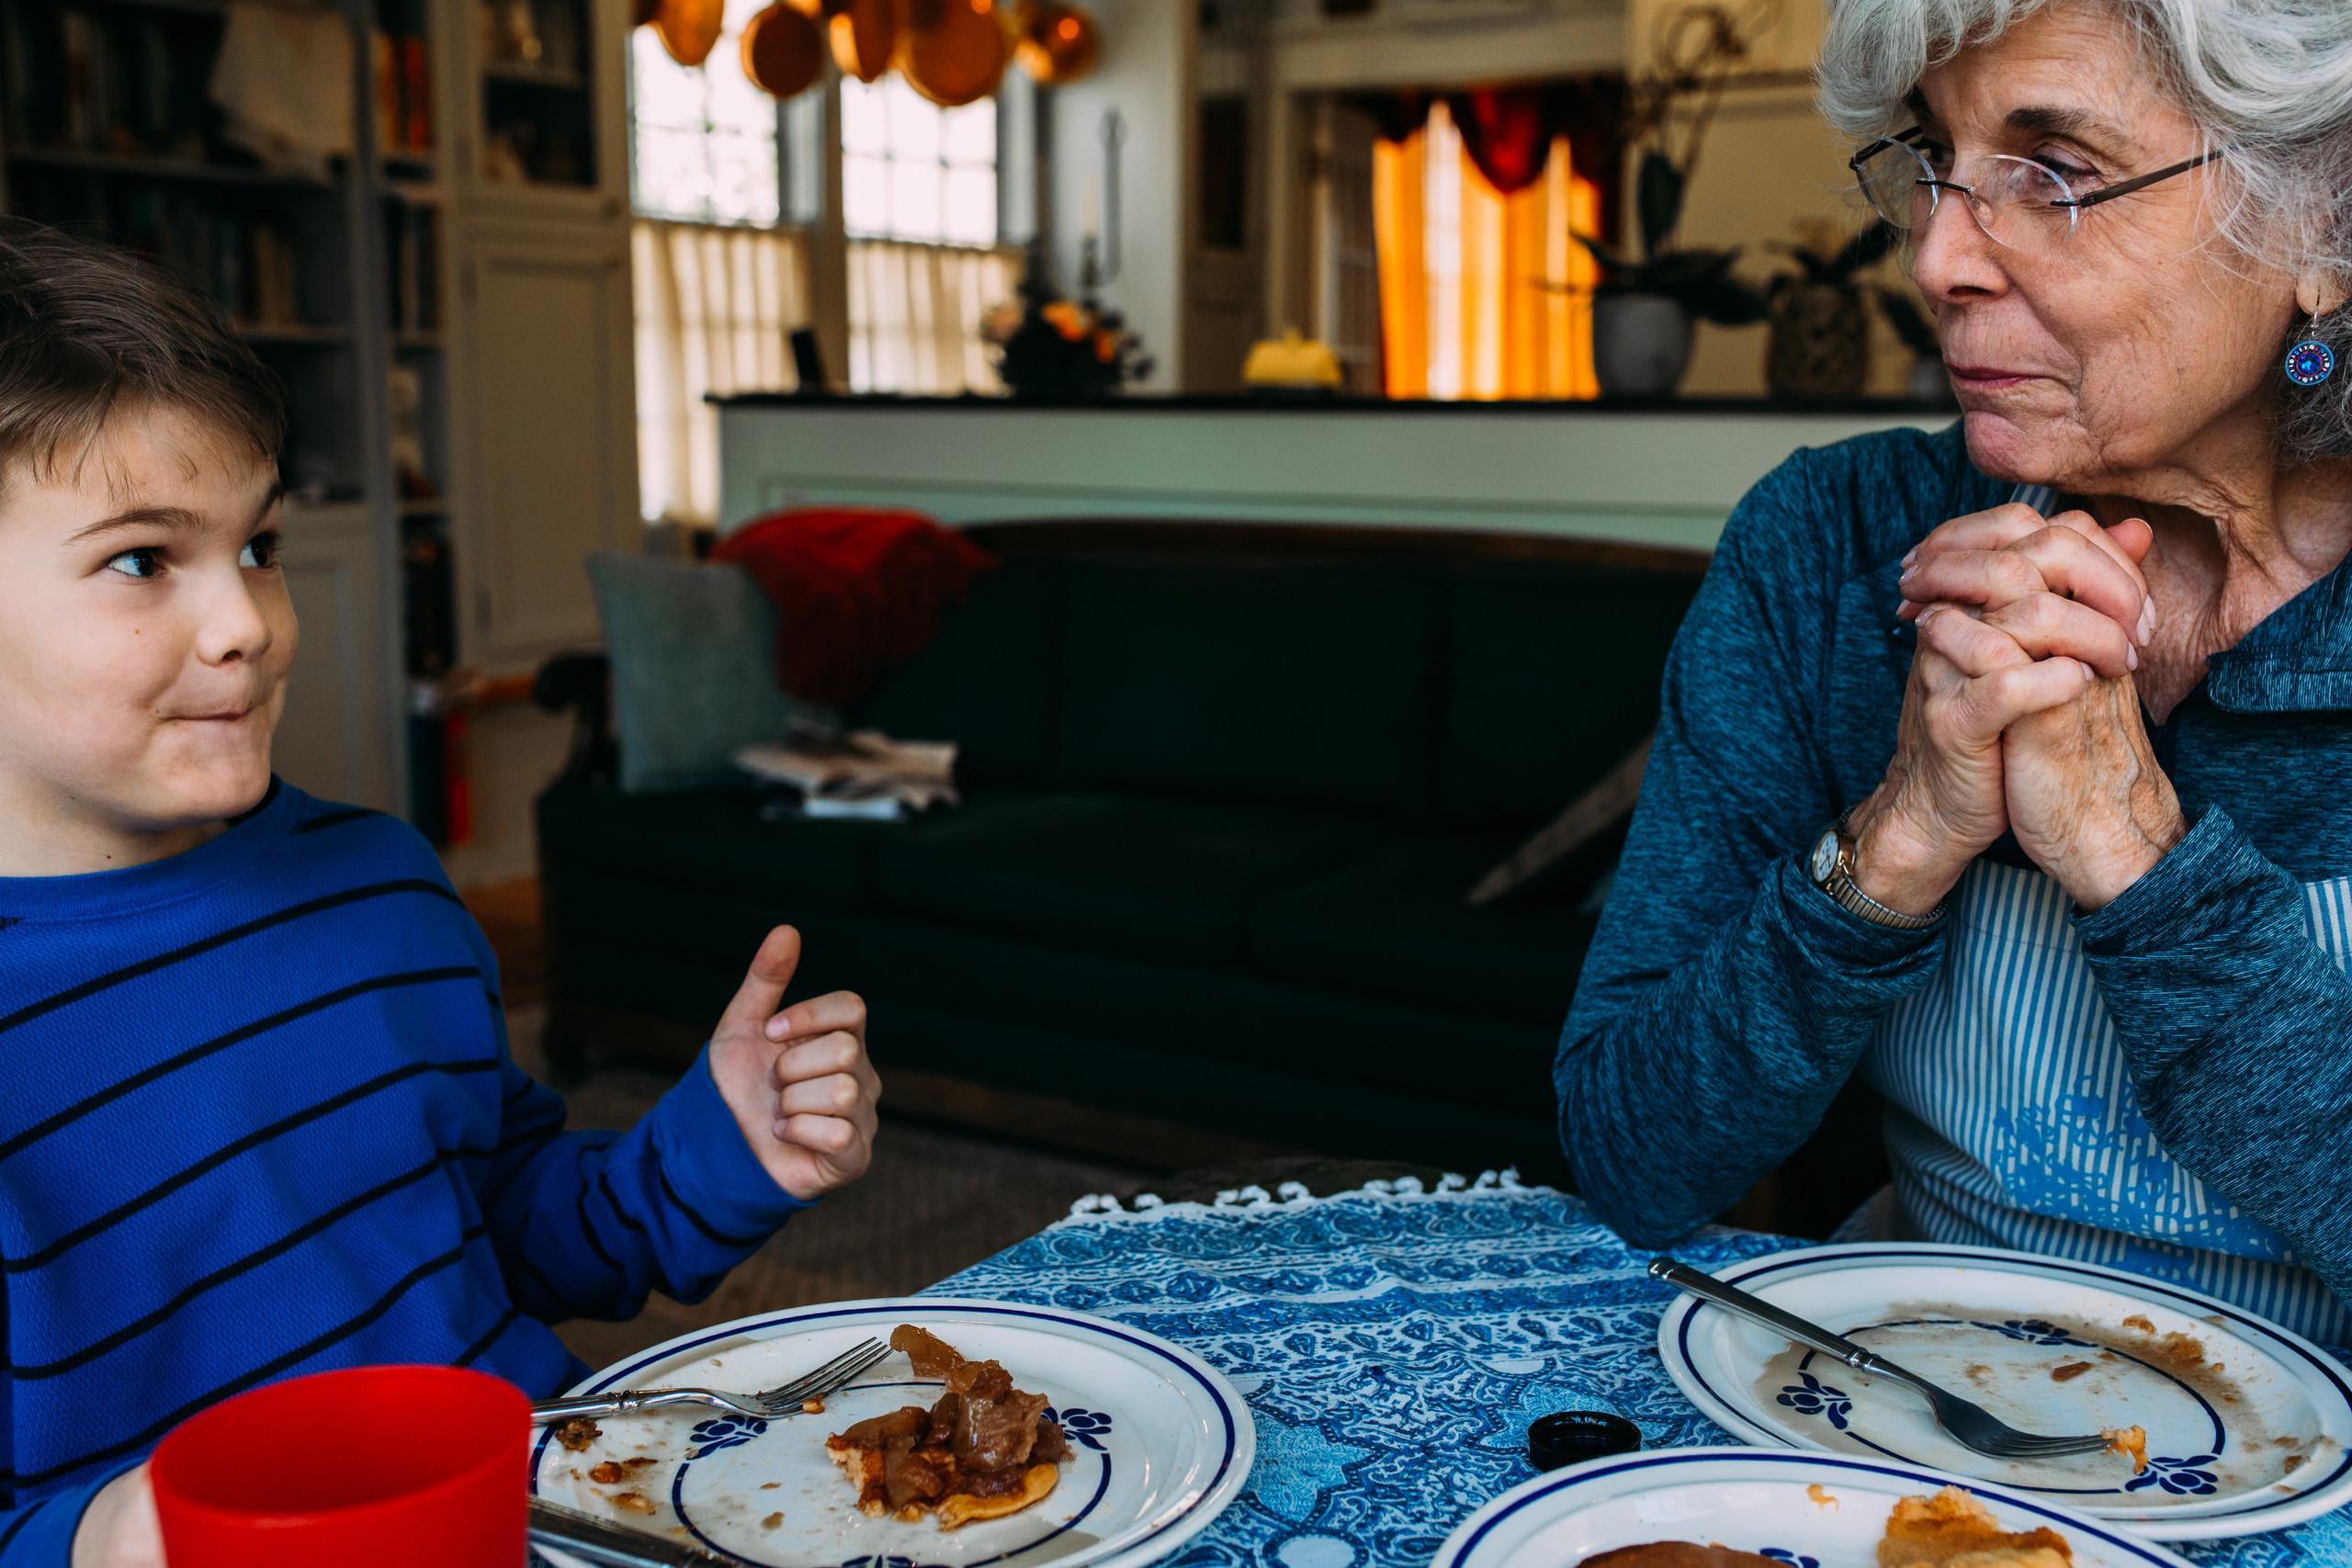 Eating with Grandma